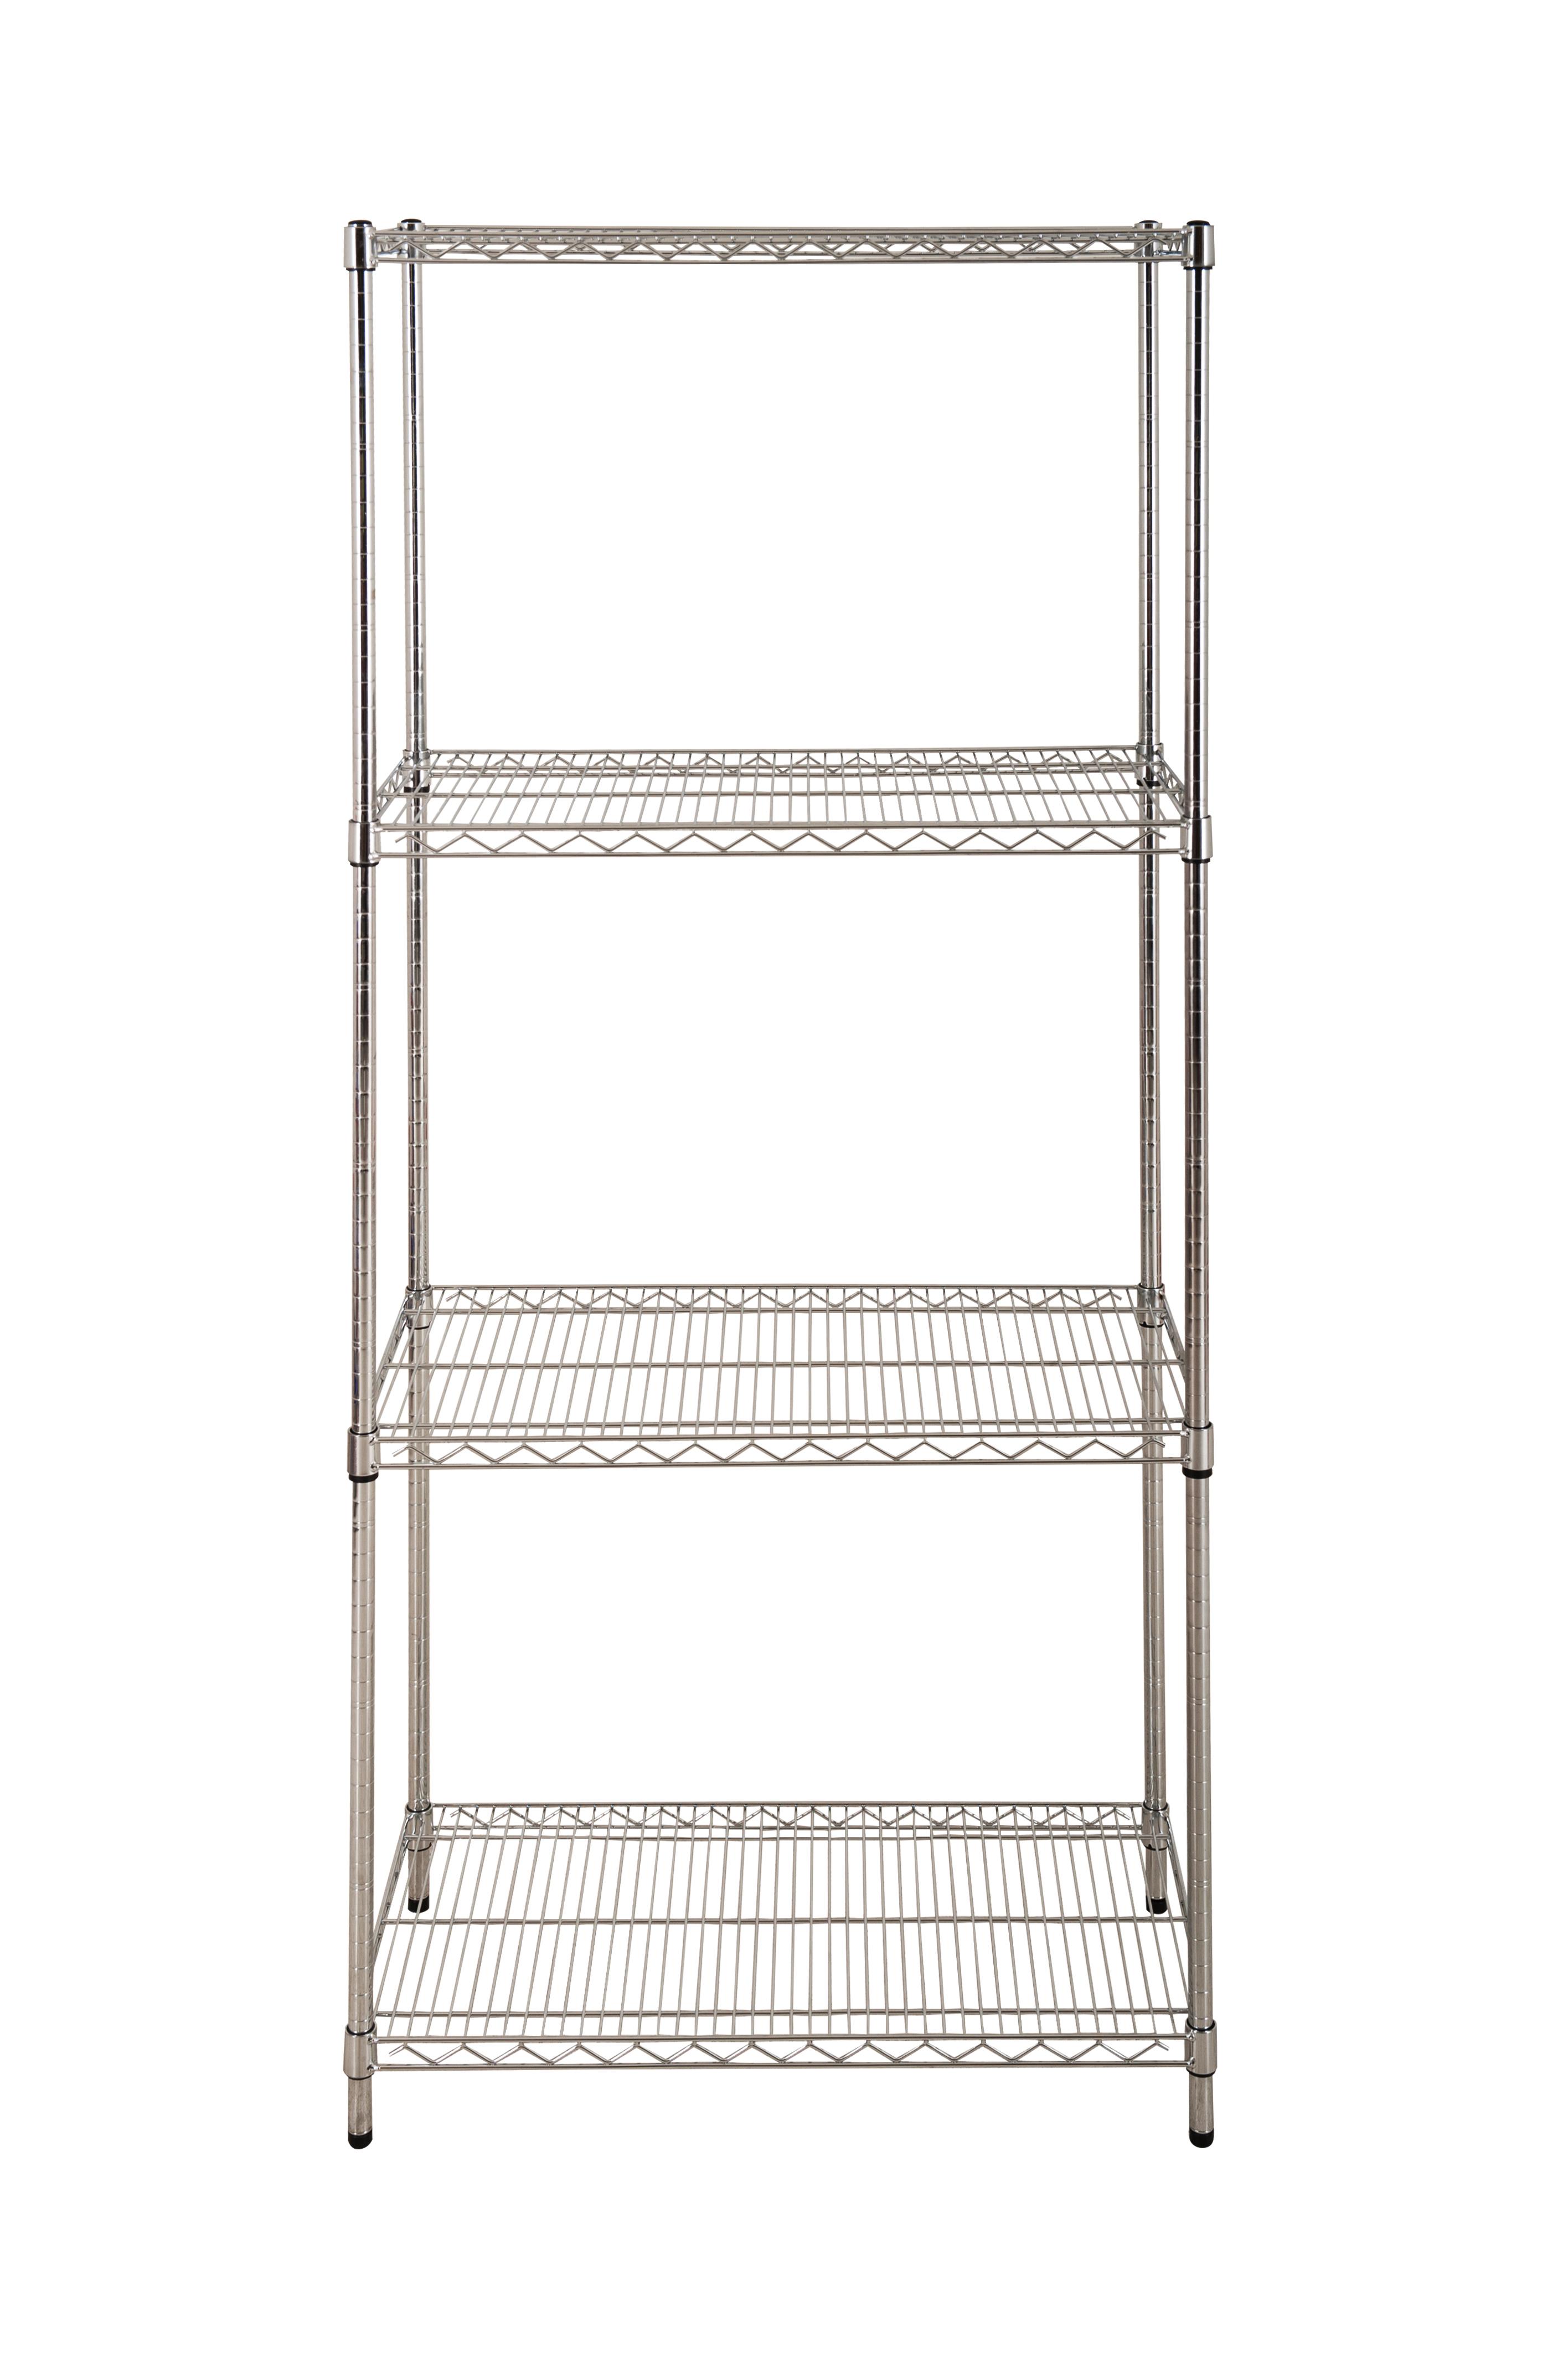 4 Shelf Chrome Starter Bay - 1880 x 1220 x 455